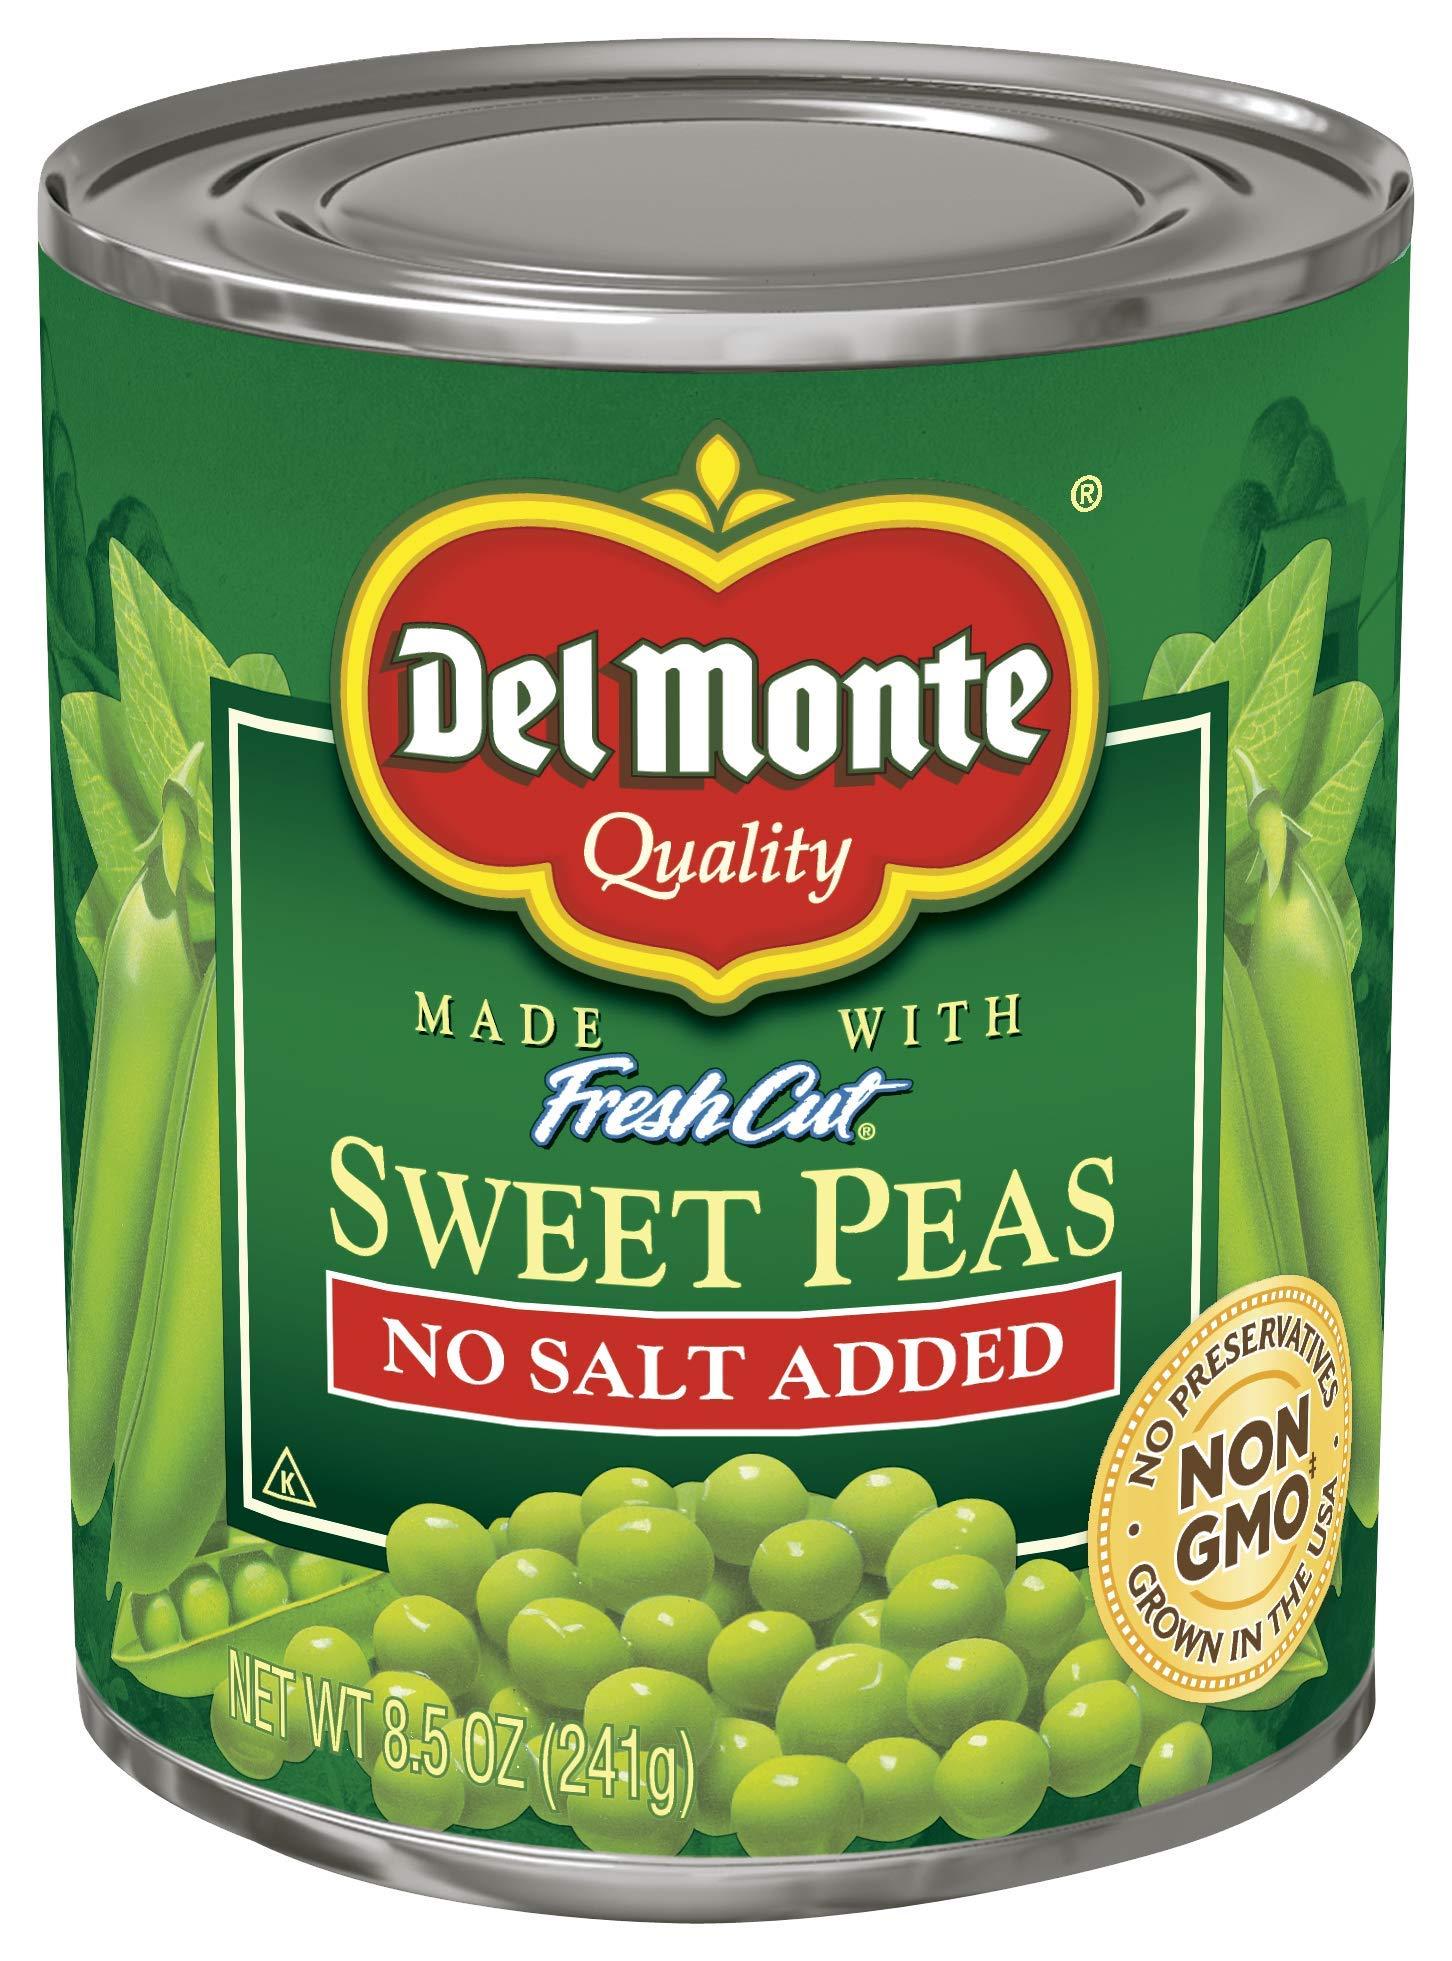 Del Monte Canned Fresh Cut Sweet Peas